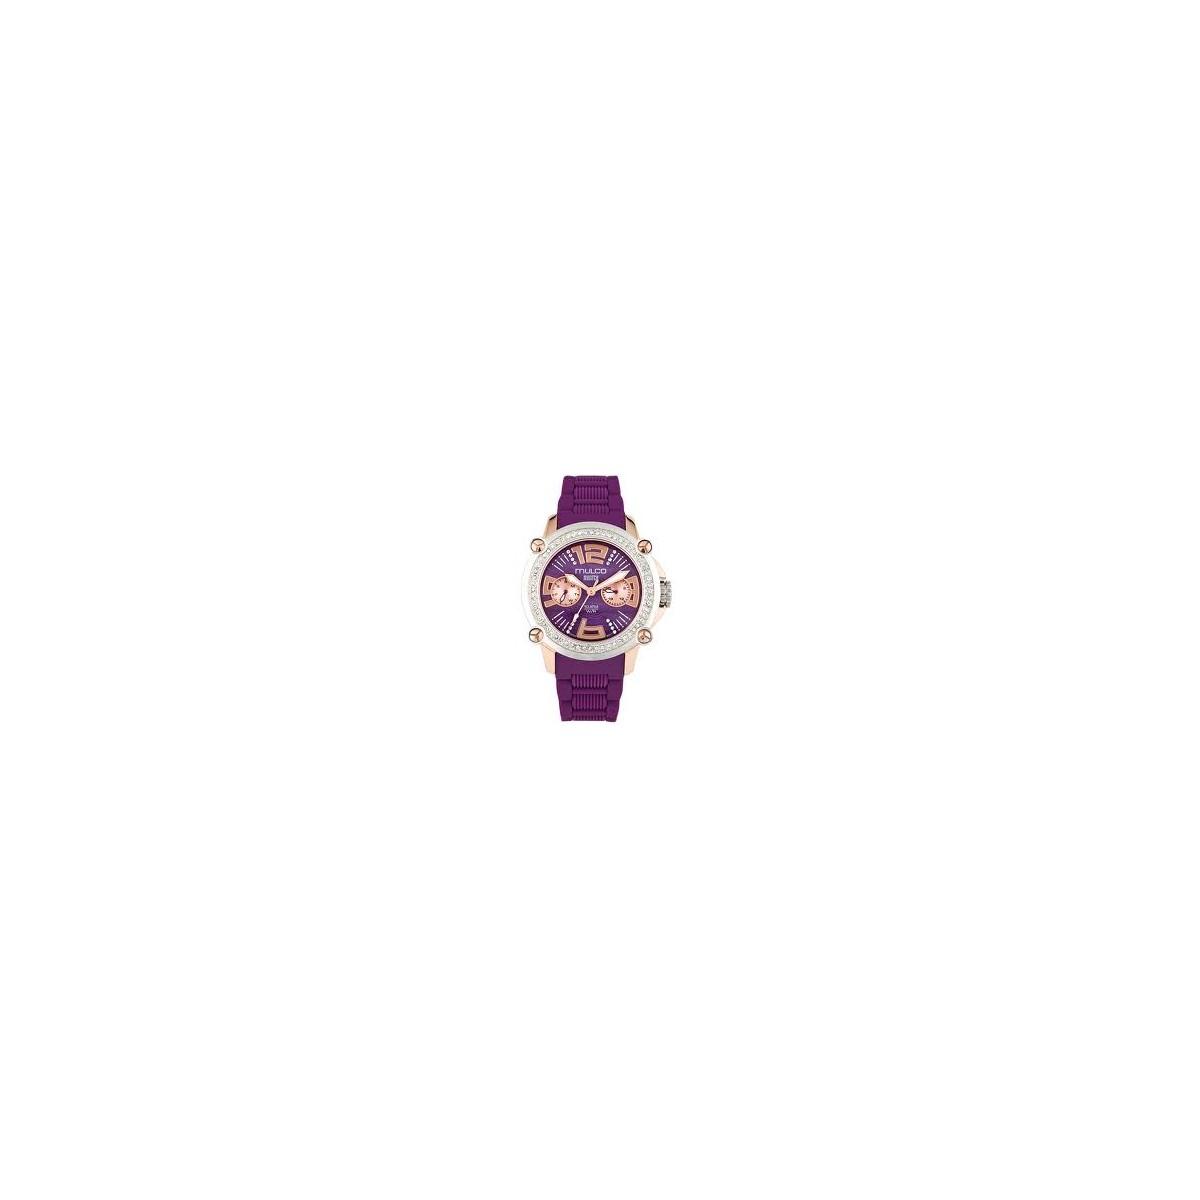 https://www.gaberjoyeria.com/1584-thickbox_default/reloj-mulco-mw280-868-054.jpg